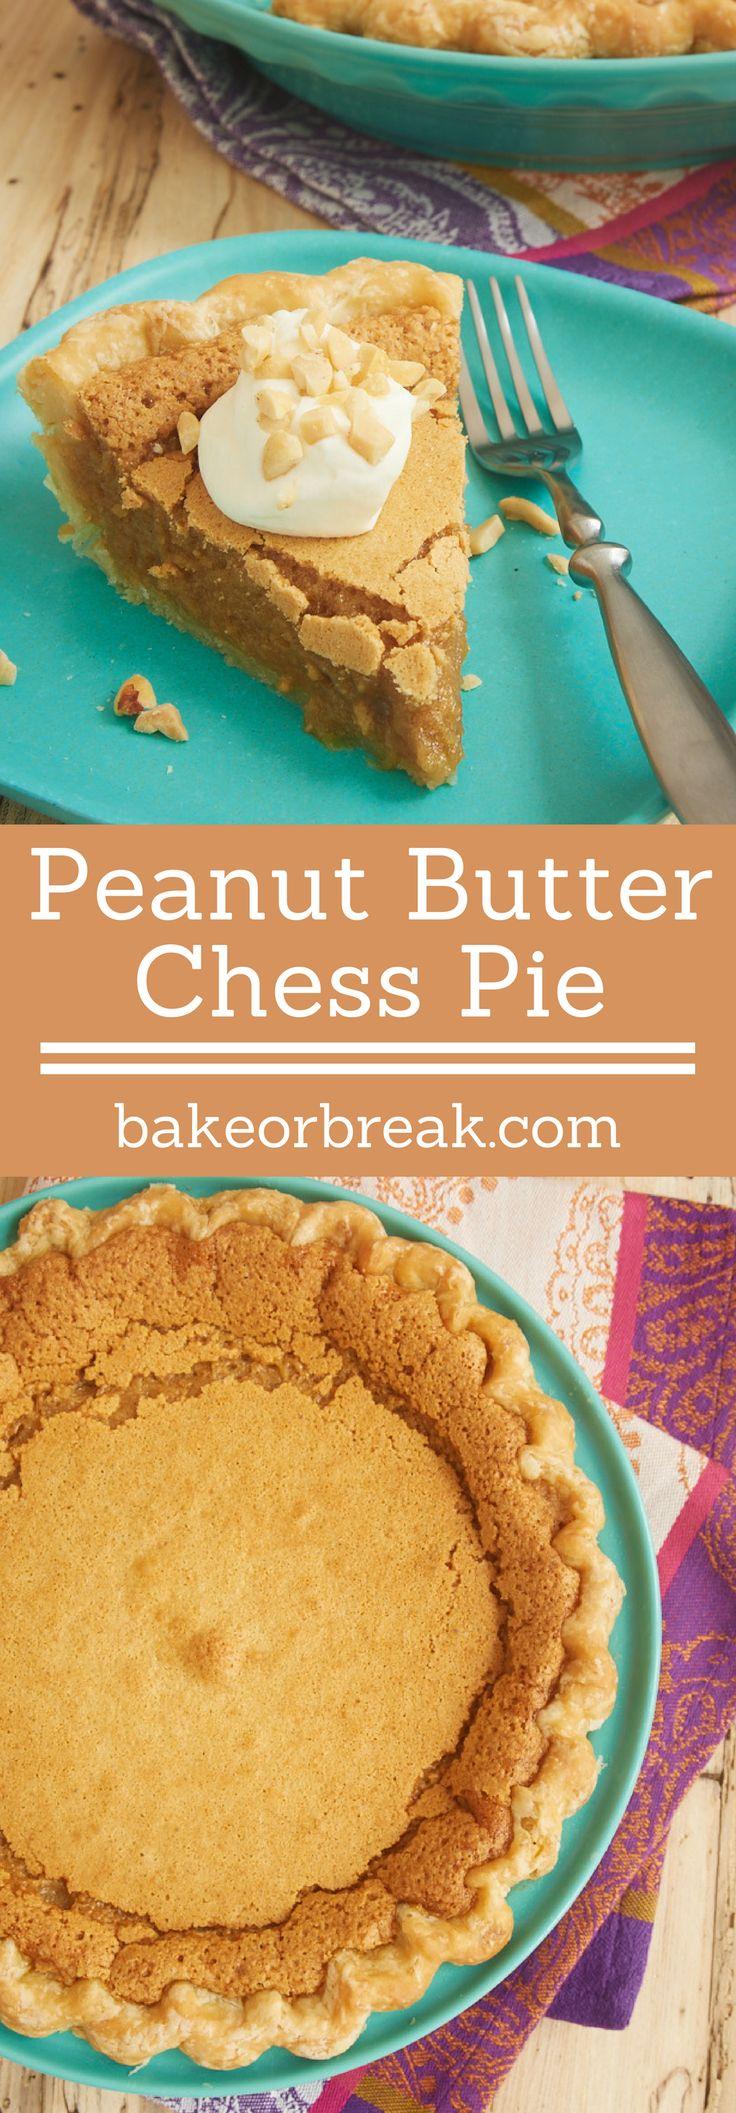 Add a peanut butter twist to a classic pie with this fantastic Peanut Butter Chess Pie! - Bake or Break ~ http://www.bakeorbreak.com